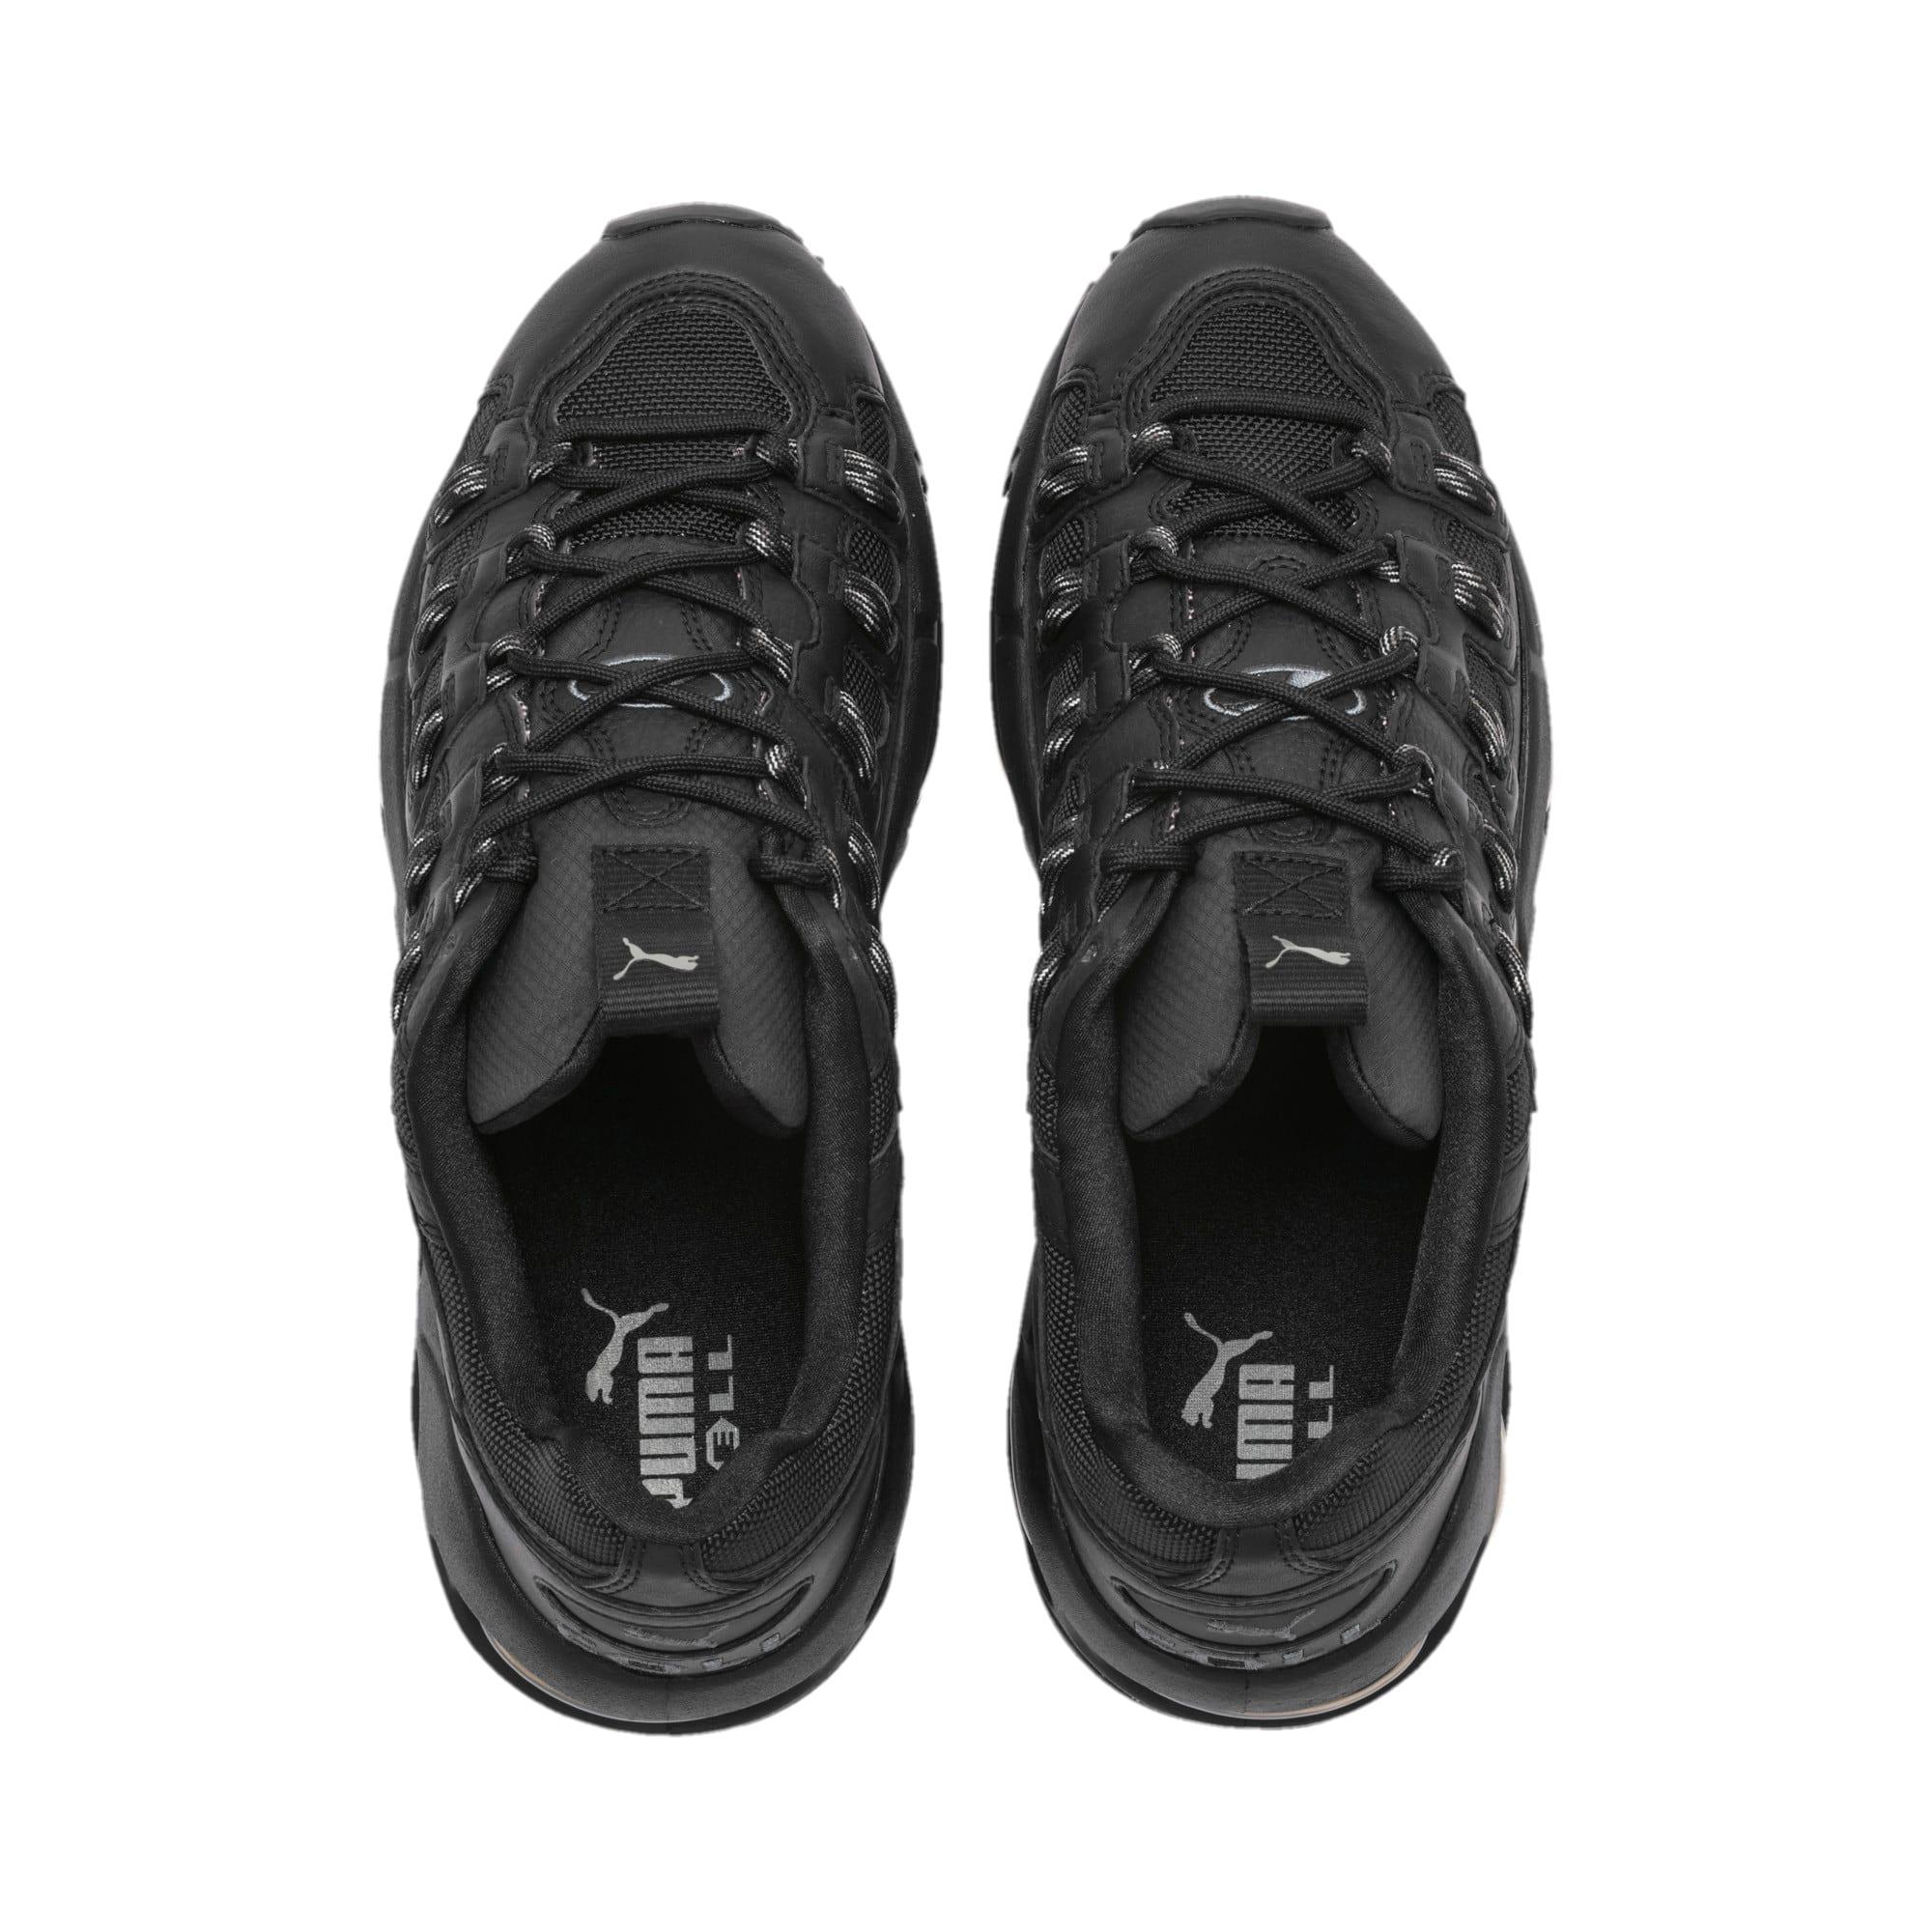 Thumbnail 7 of CELL Endura Rebound Sneakers, Puma Black-Puma Black, medium